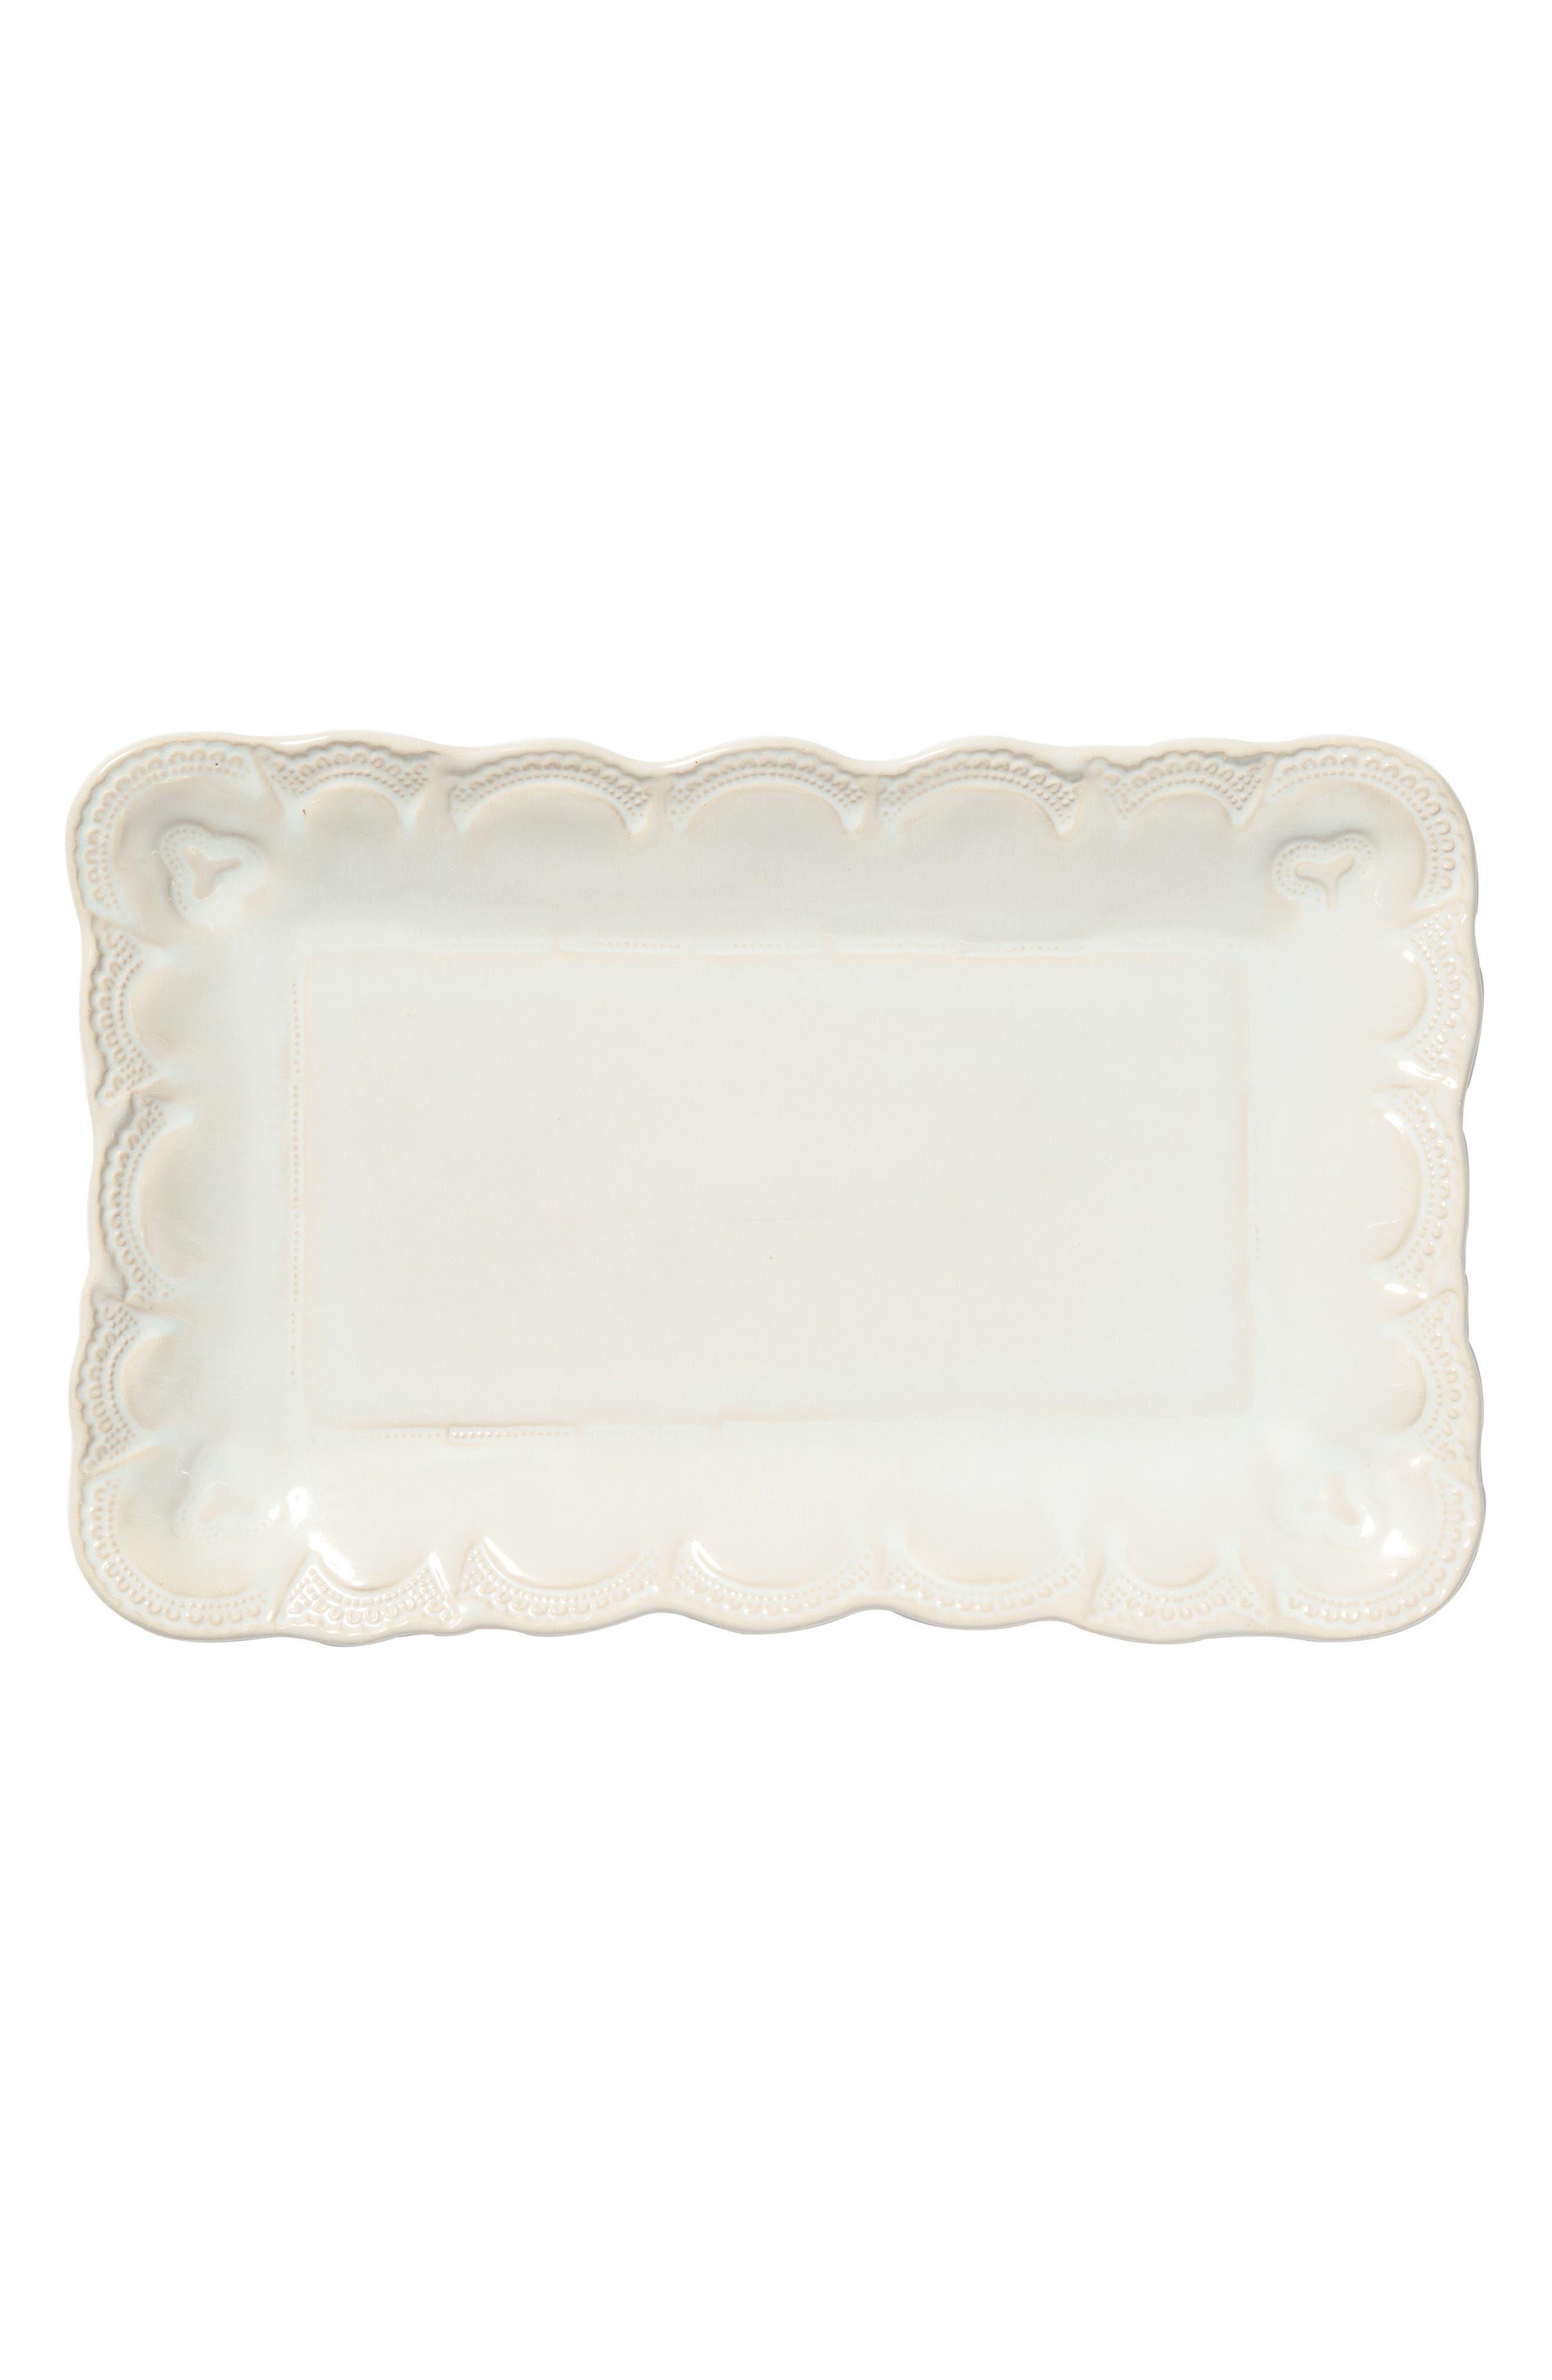 Incanto Stone Lace Small Serving Platter,                             Main thumbnail 1, color,                             Linen